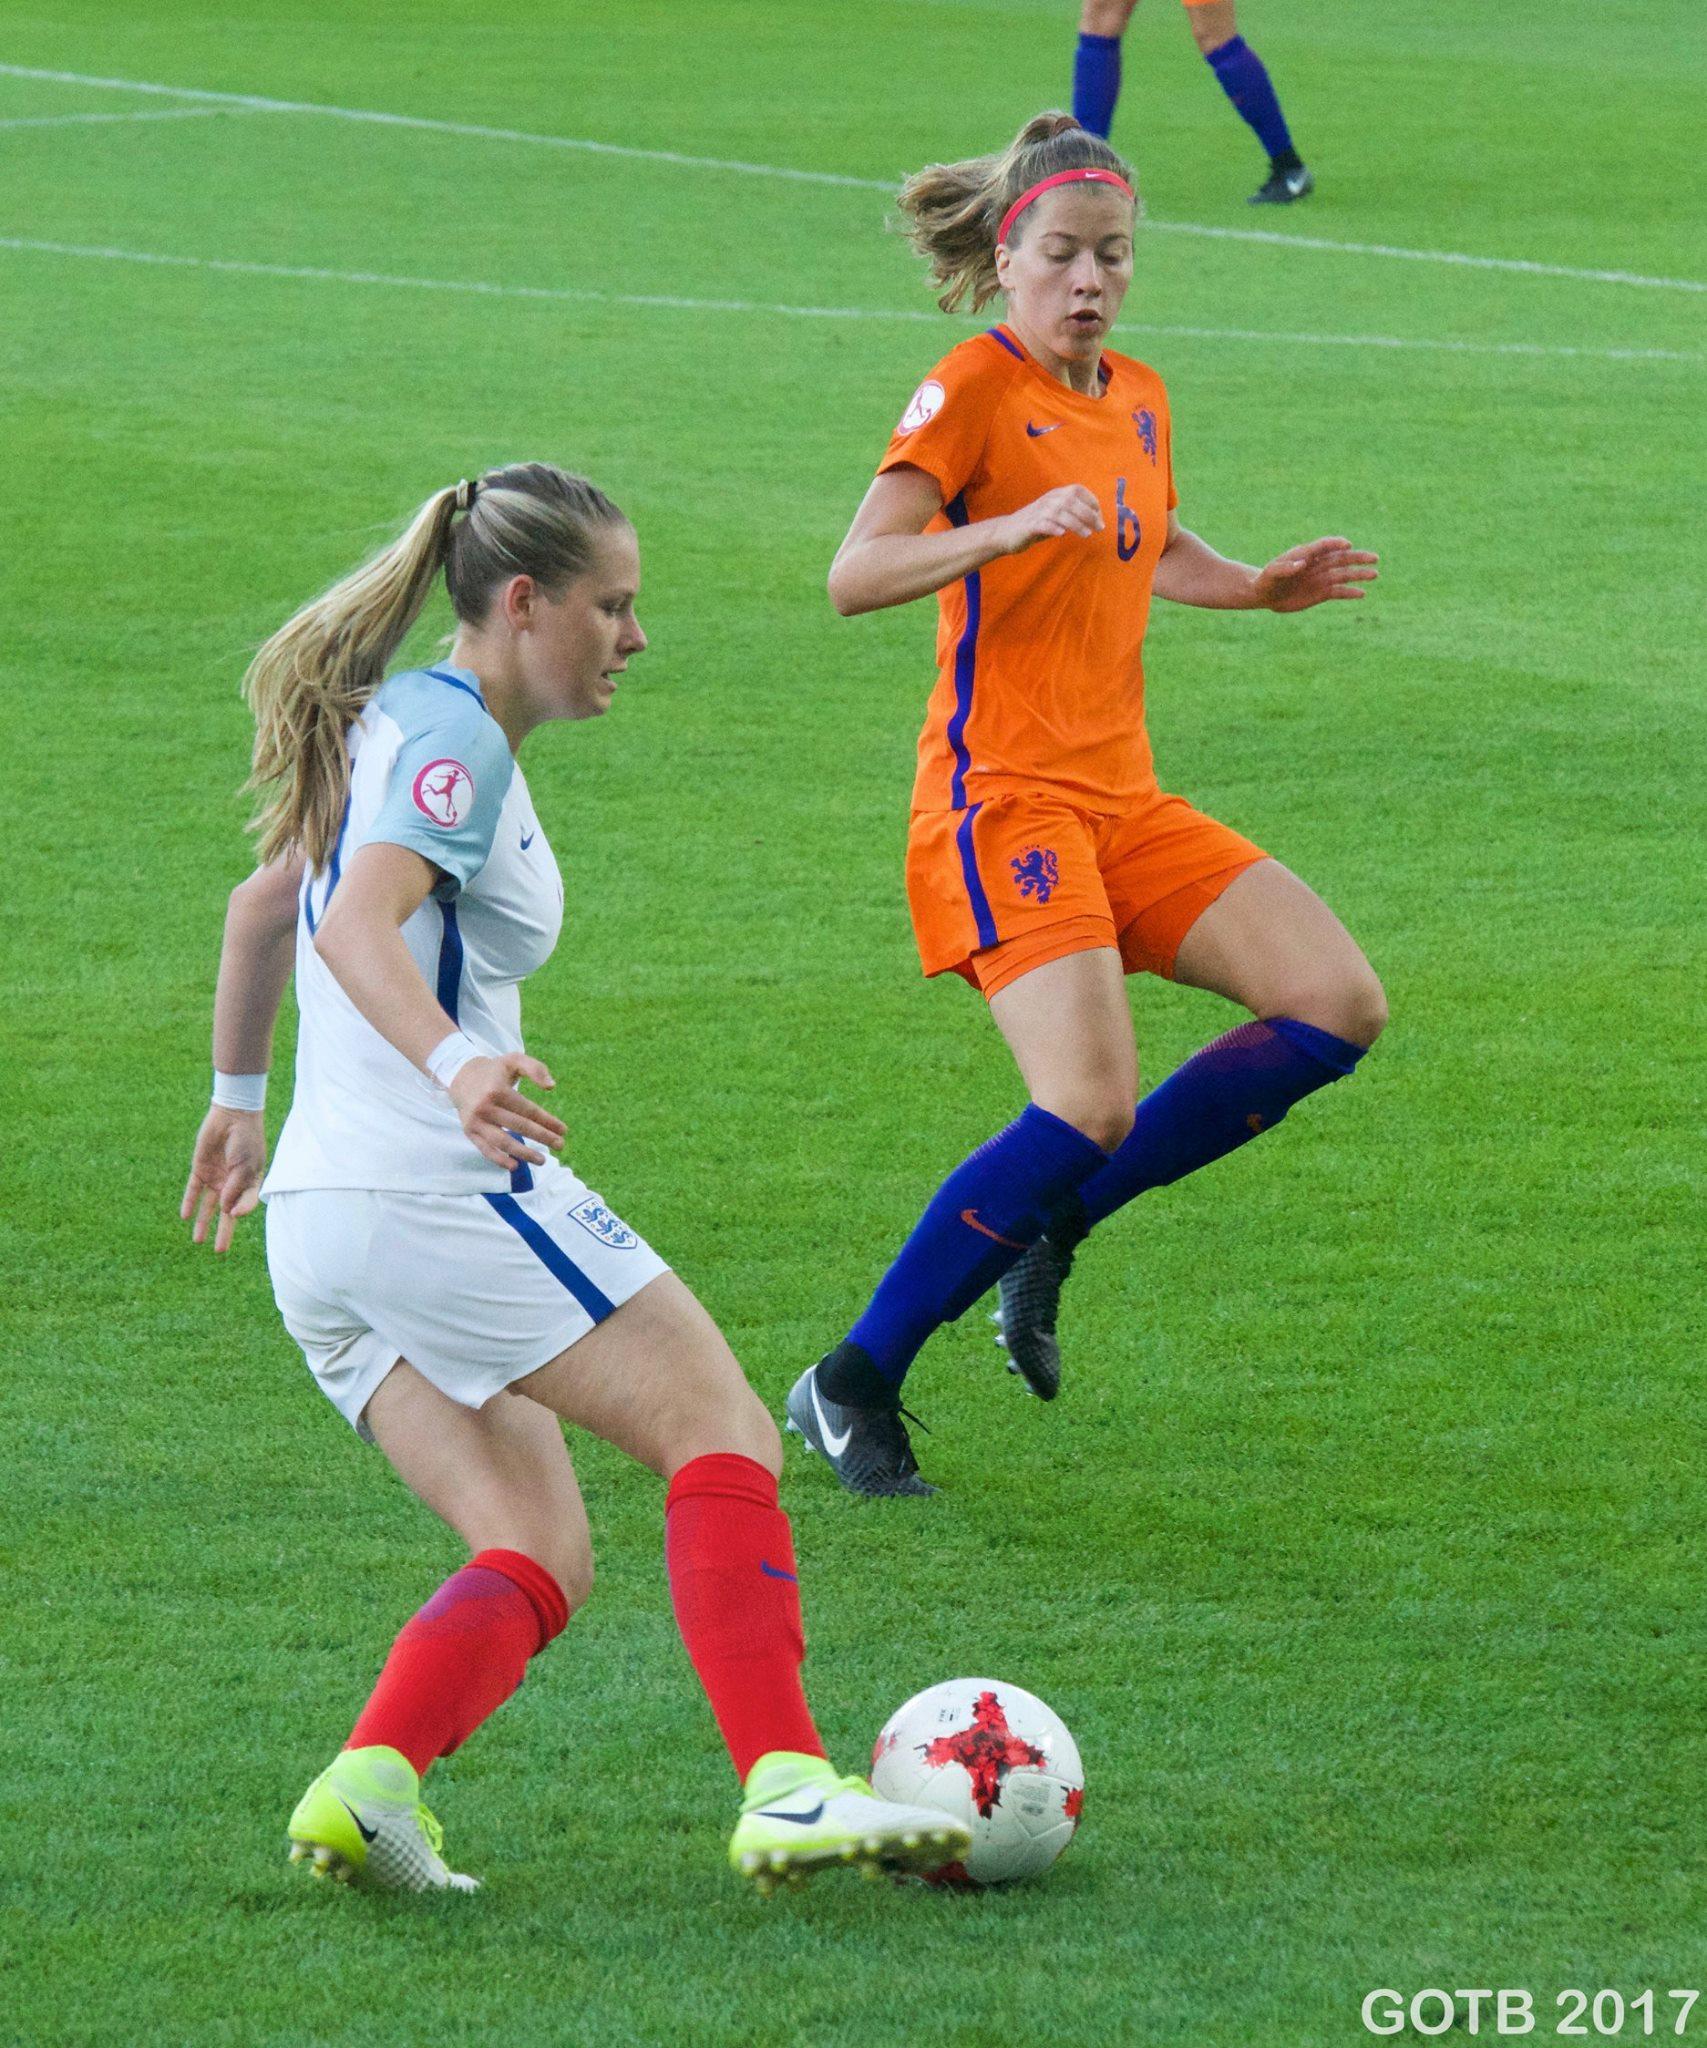 England U19s v Netherlands, U19 Euro 2017